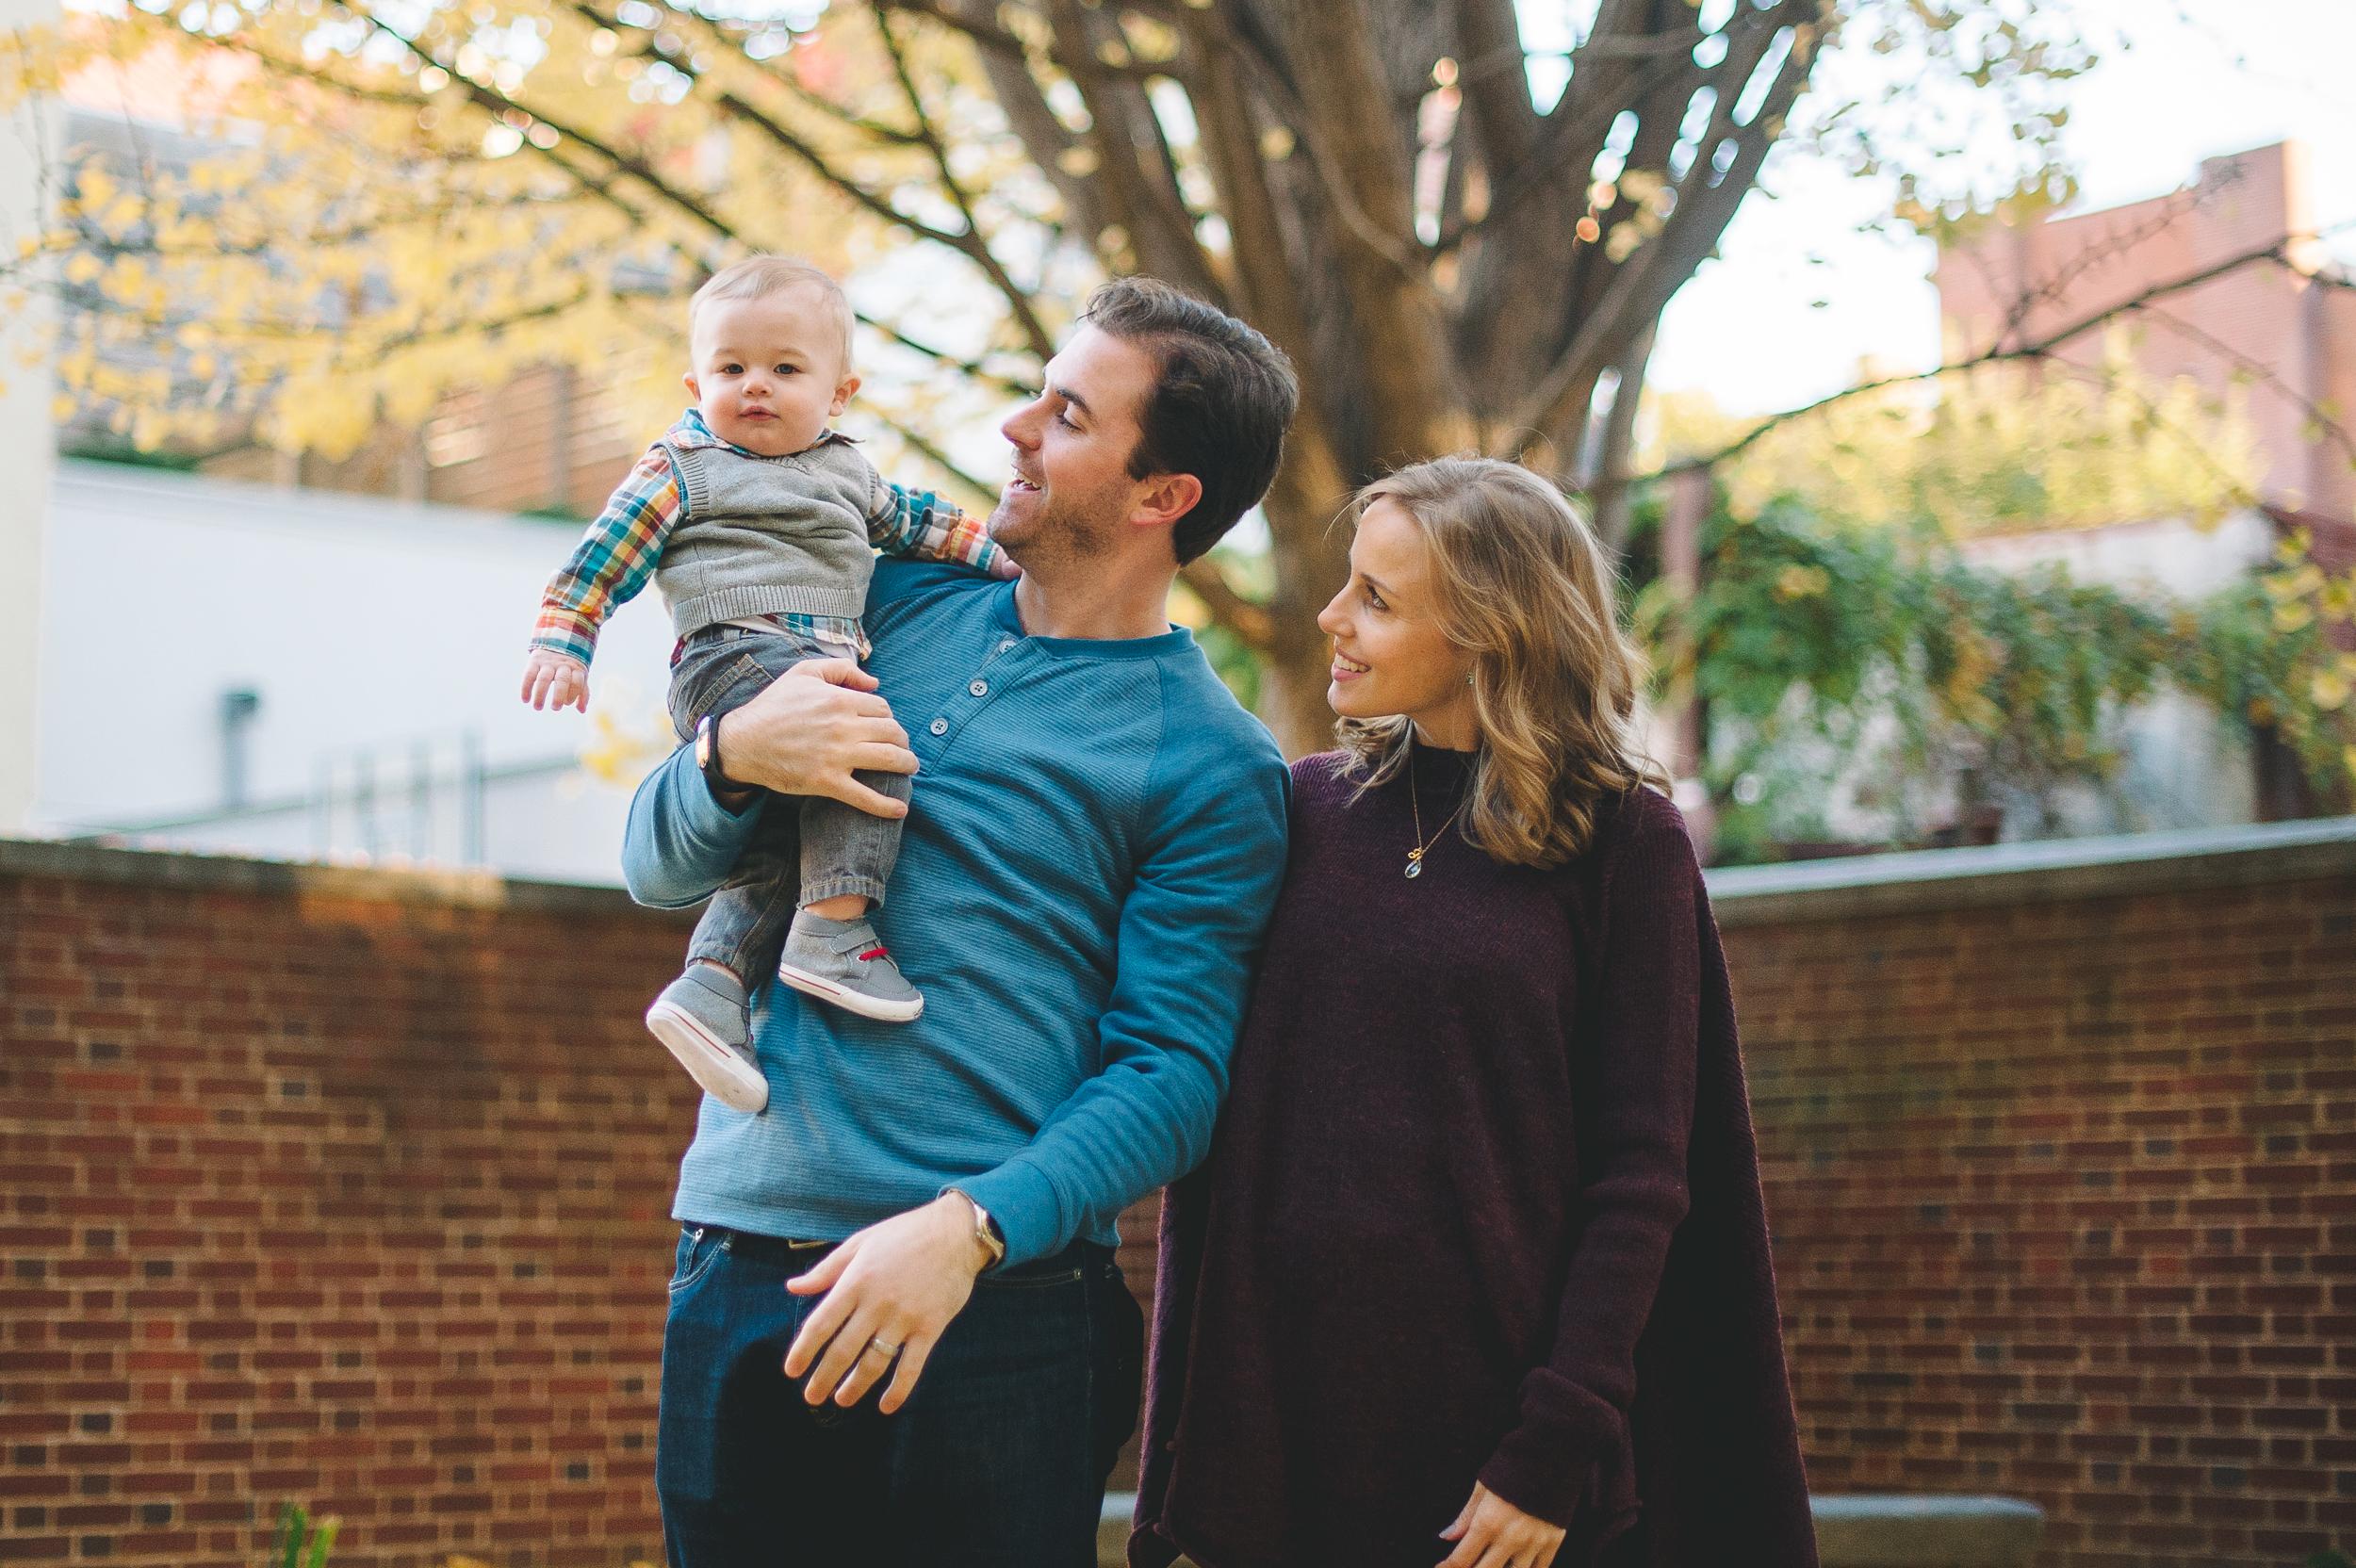 Peaberry-Photography-Philadlphia-Family-Portraits-018.jpg